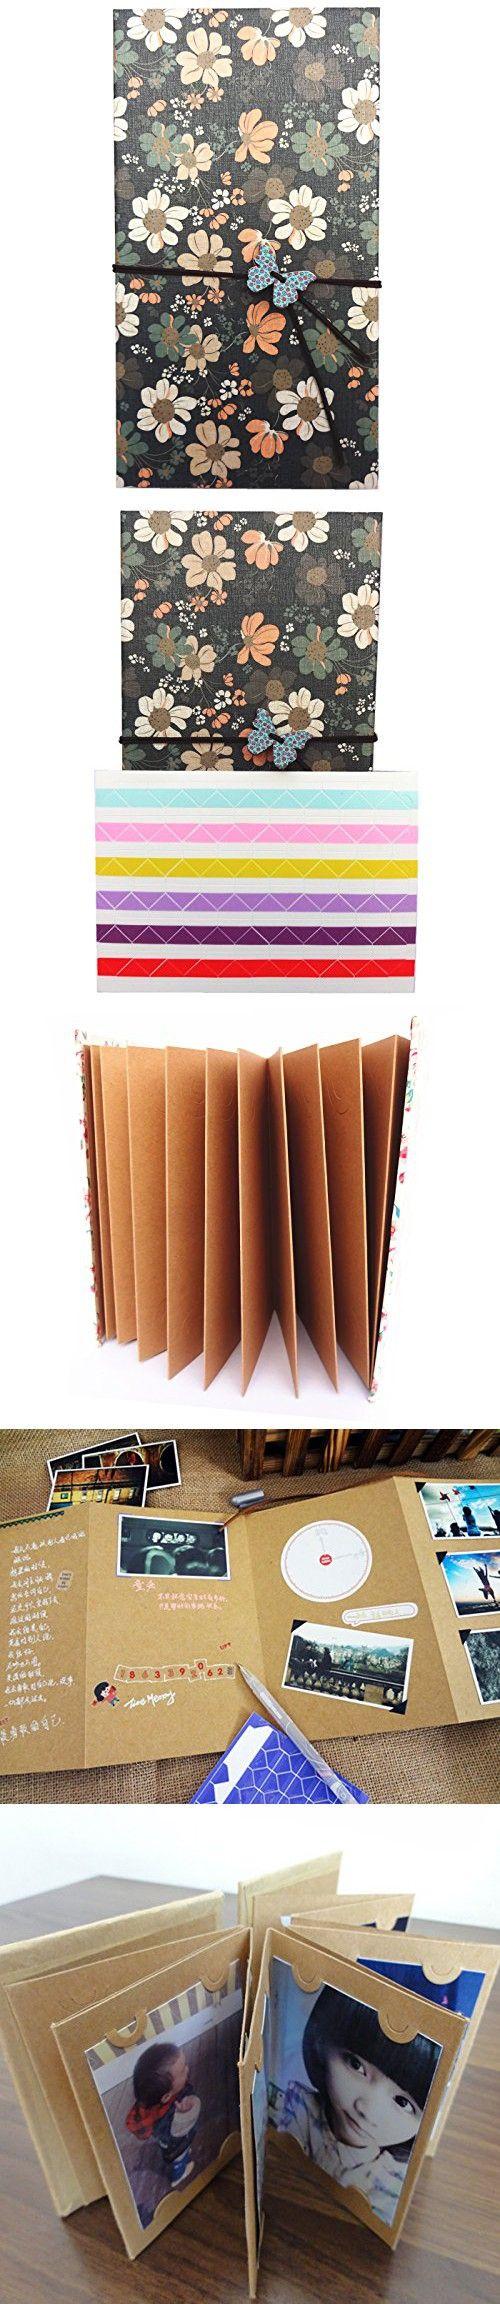 Duolaisu DIY Handmade Cloth Hardcover Kraft Paper Retro Accordion Style Photo Album 8.5x4.5Inch, Holds 4 x 6Inch Photos,One Self-adhesive Photo Corners